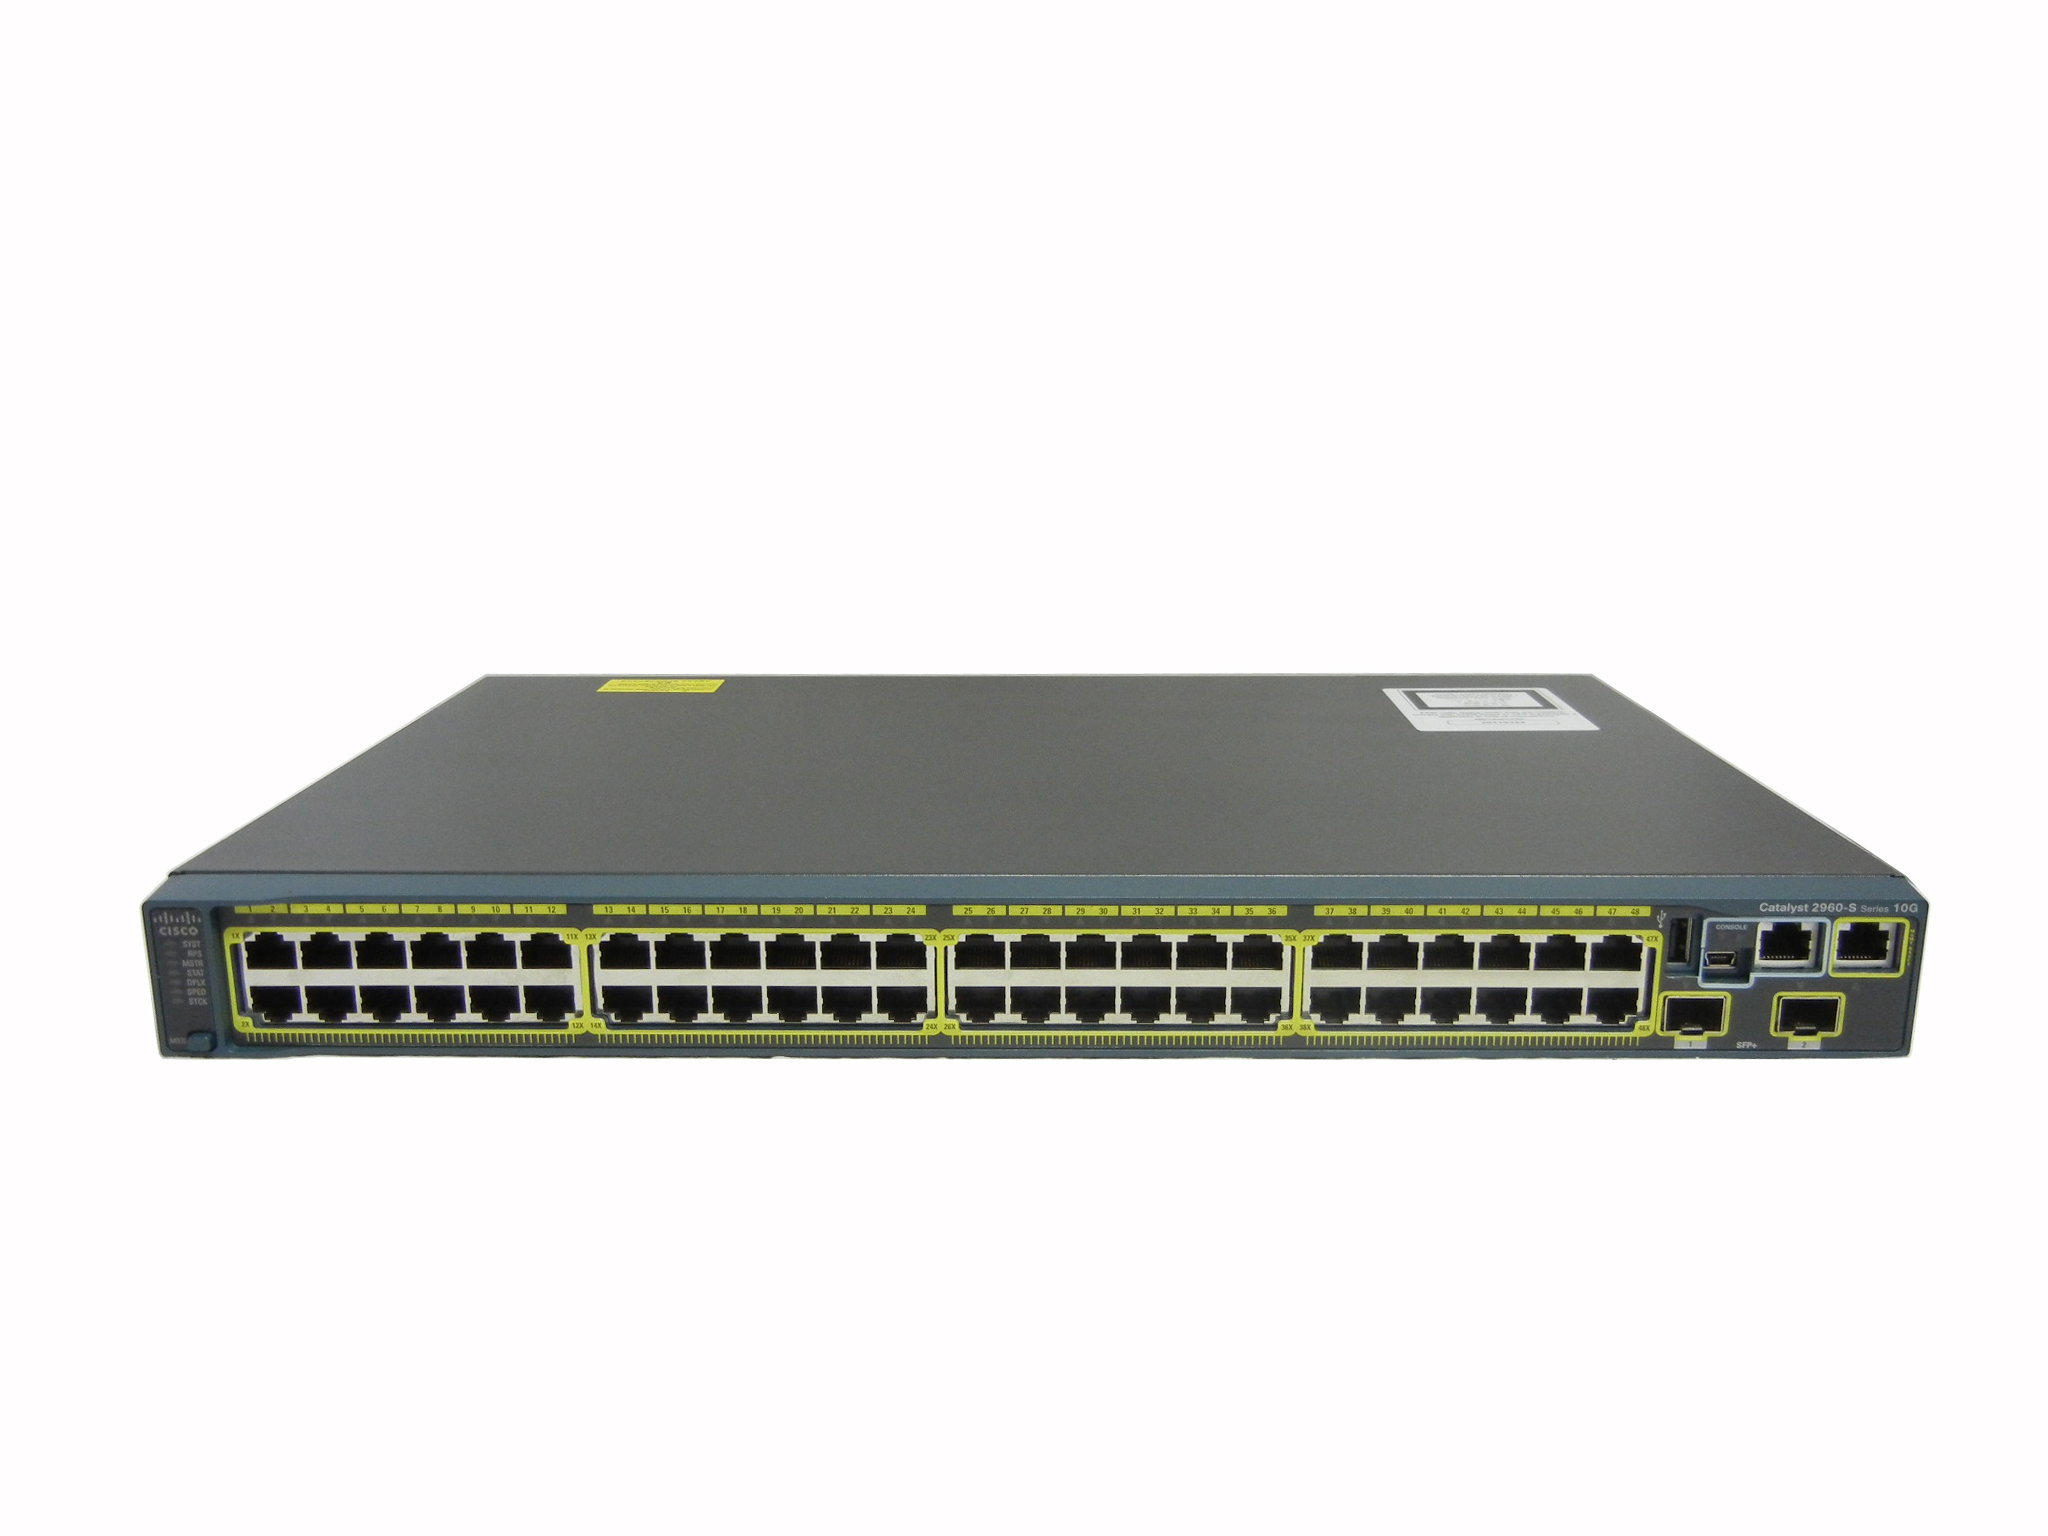 【中古】Cisco Catalyst 2960S-48TD-L (WS-C2960S-48TD-L)